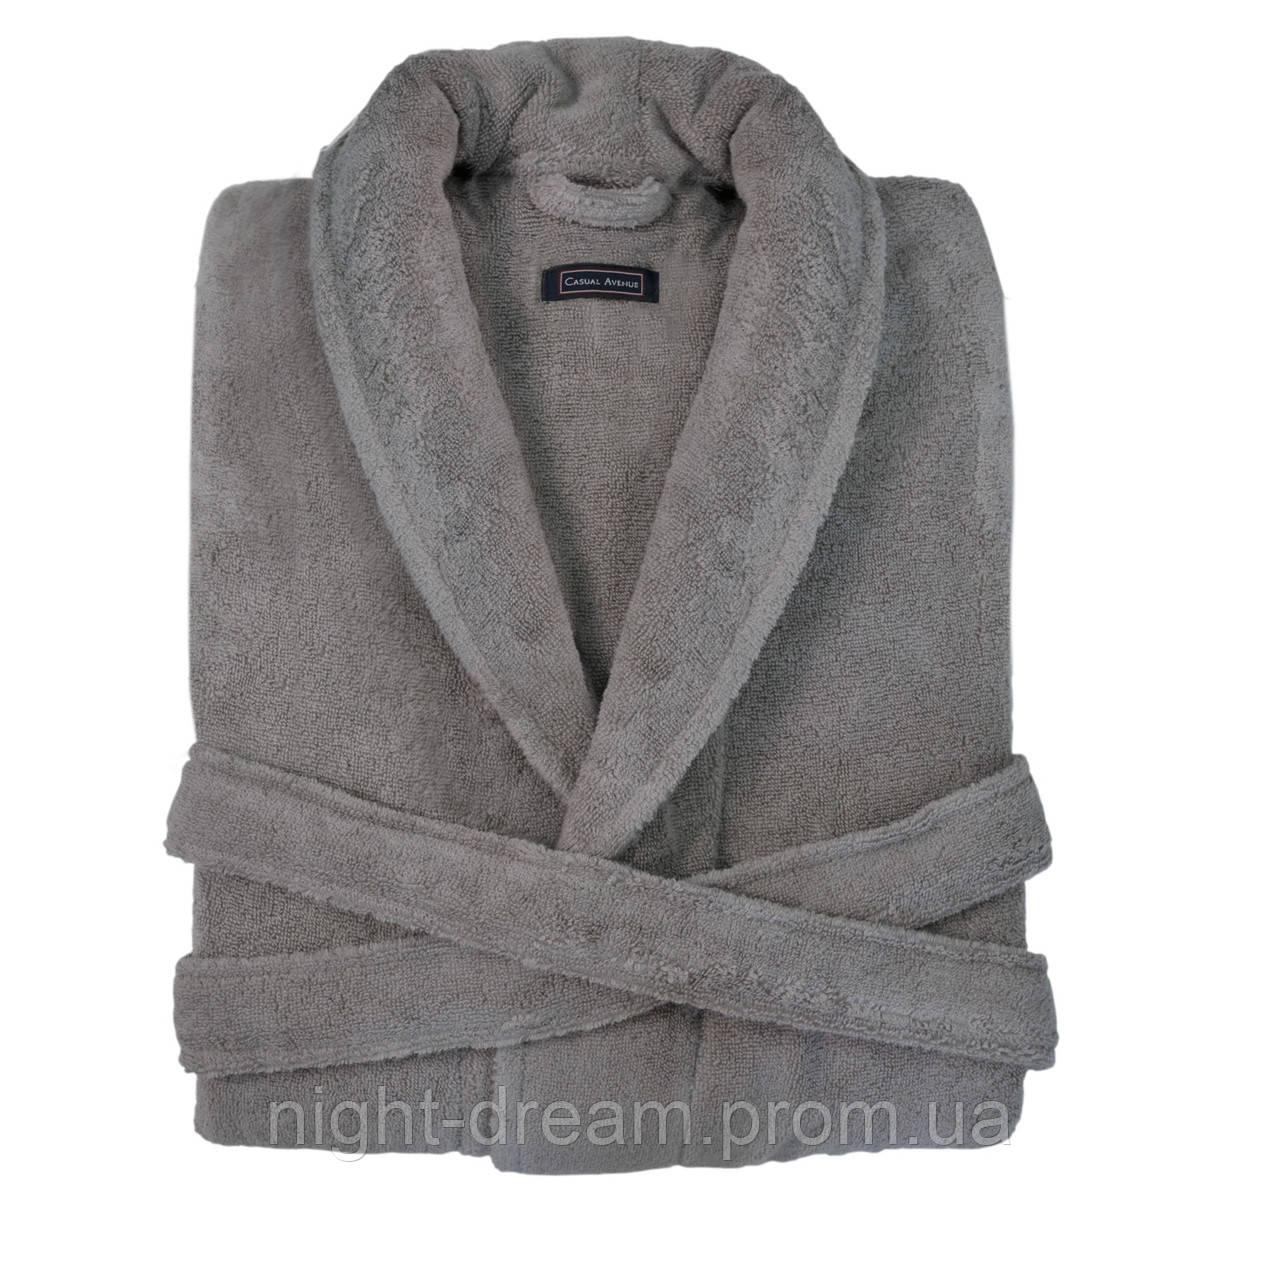 Женский махровый халат CASUAL AVENUE Chicago Warm Gray размер XL